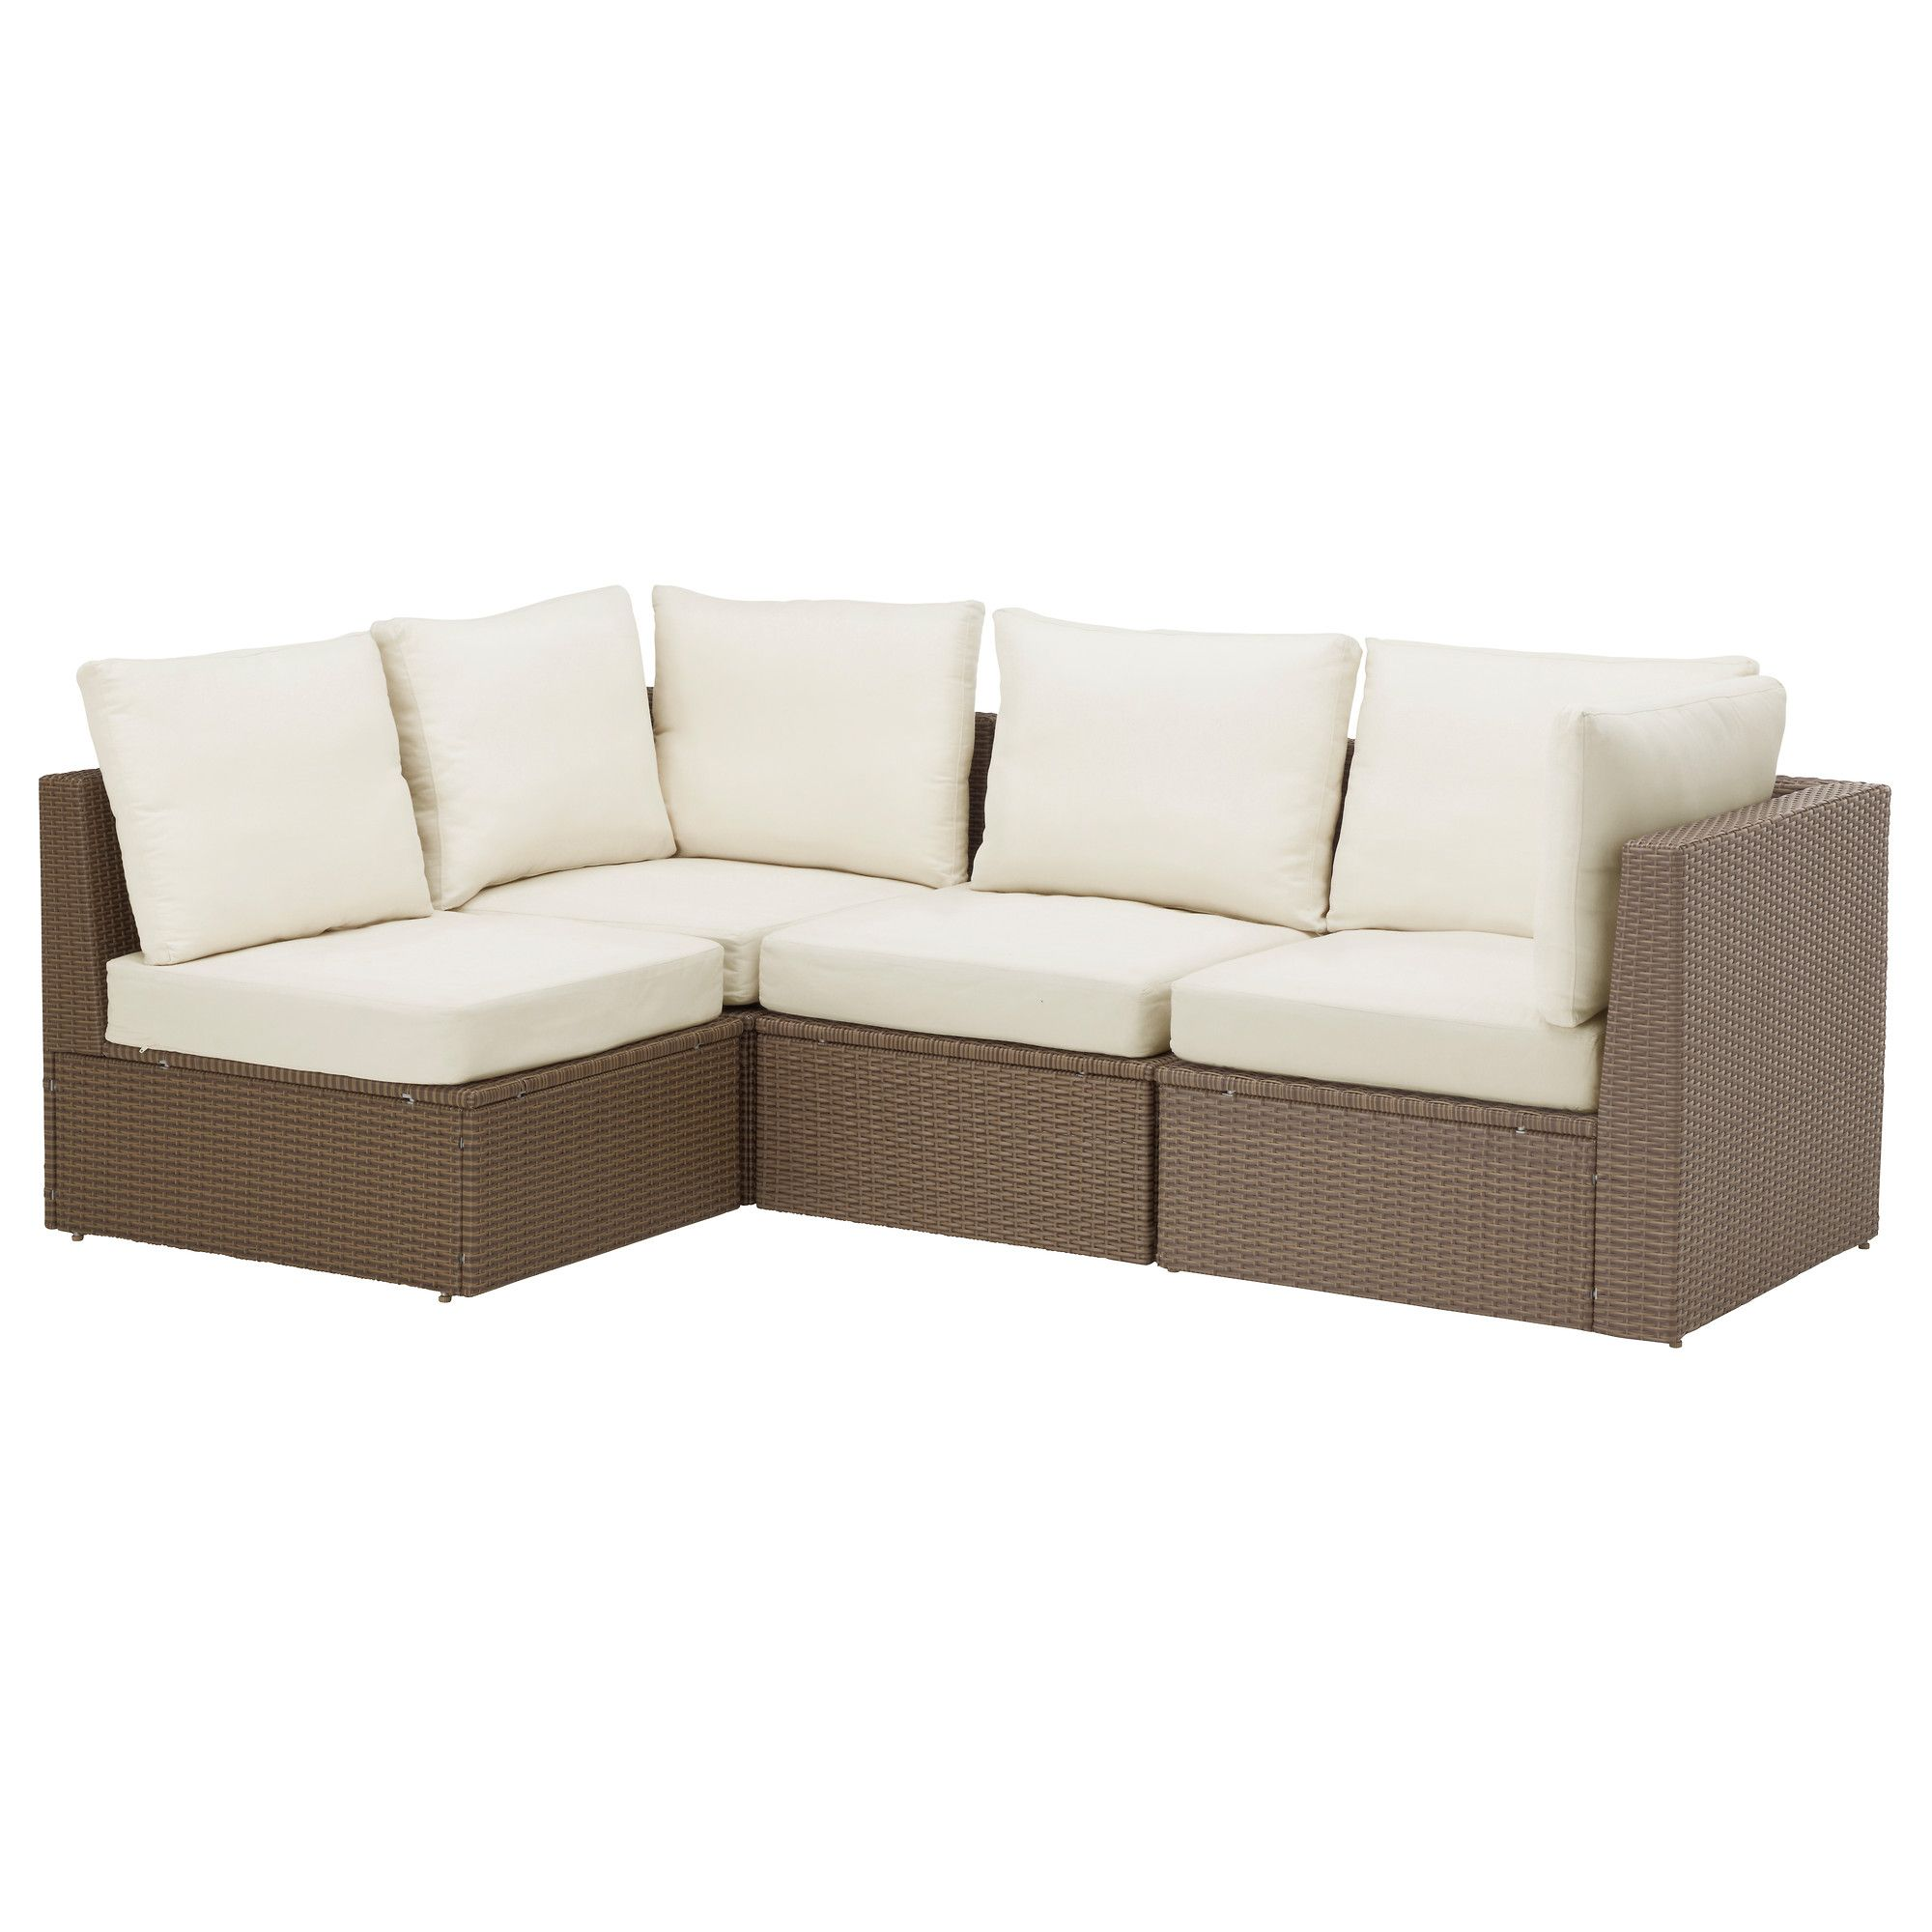 arholma ecksofa 3 1 au en braun beige jetzt bestellen unter. Black Bedroom Furniture Sets. Home Design Ideas